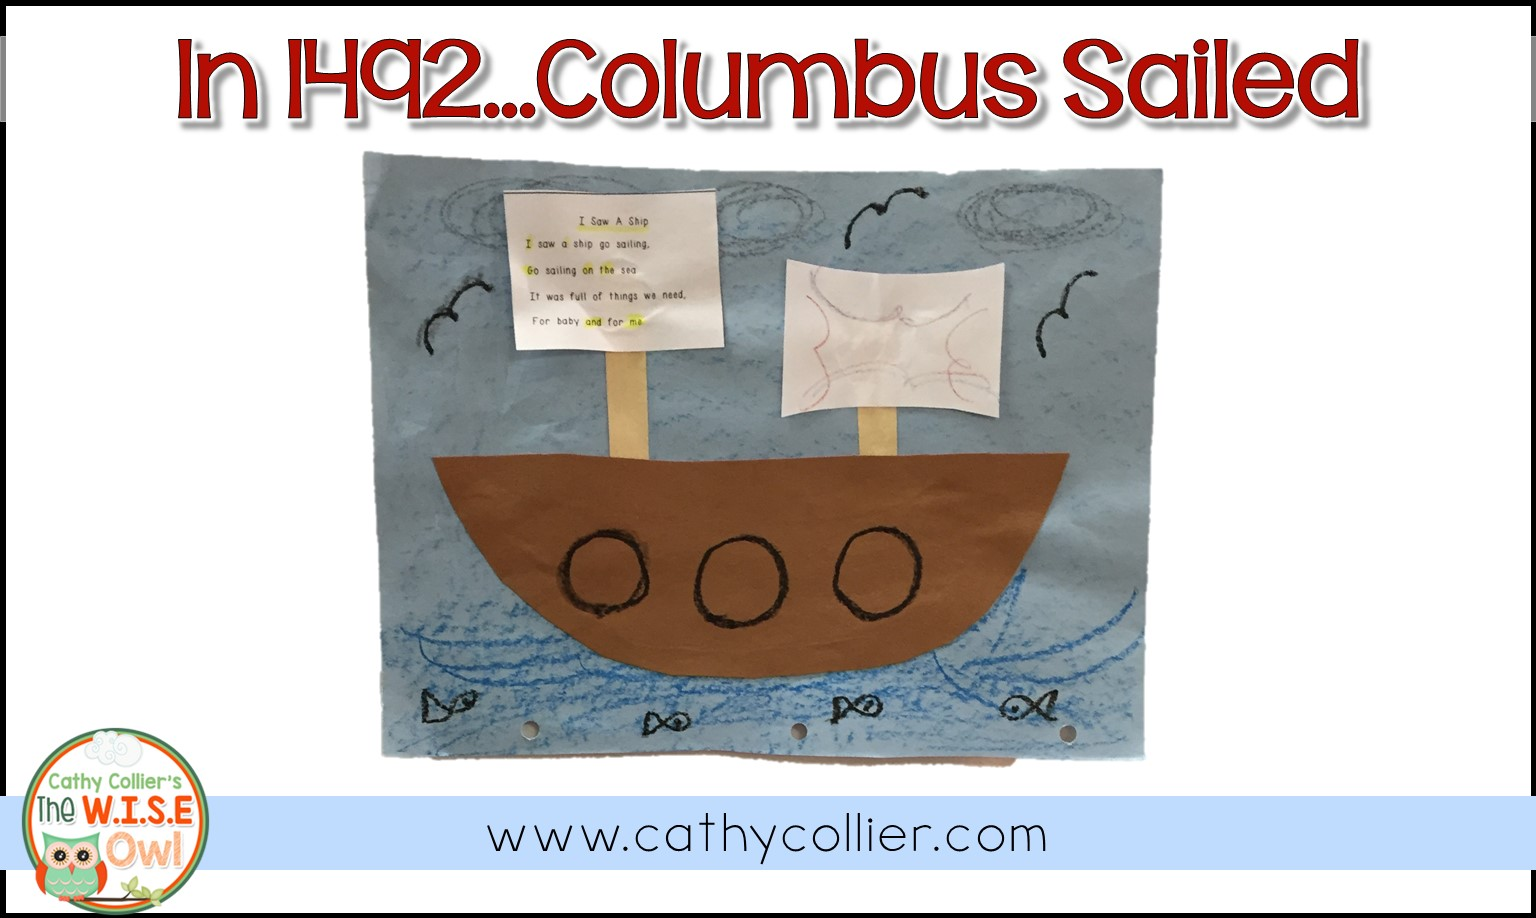 Columbus sailed the ocean blue